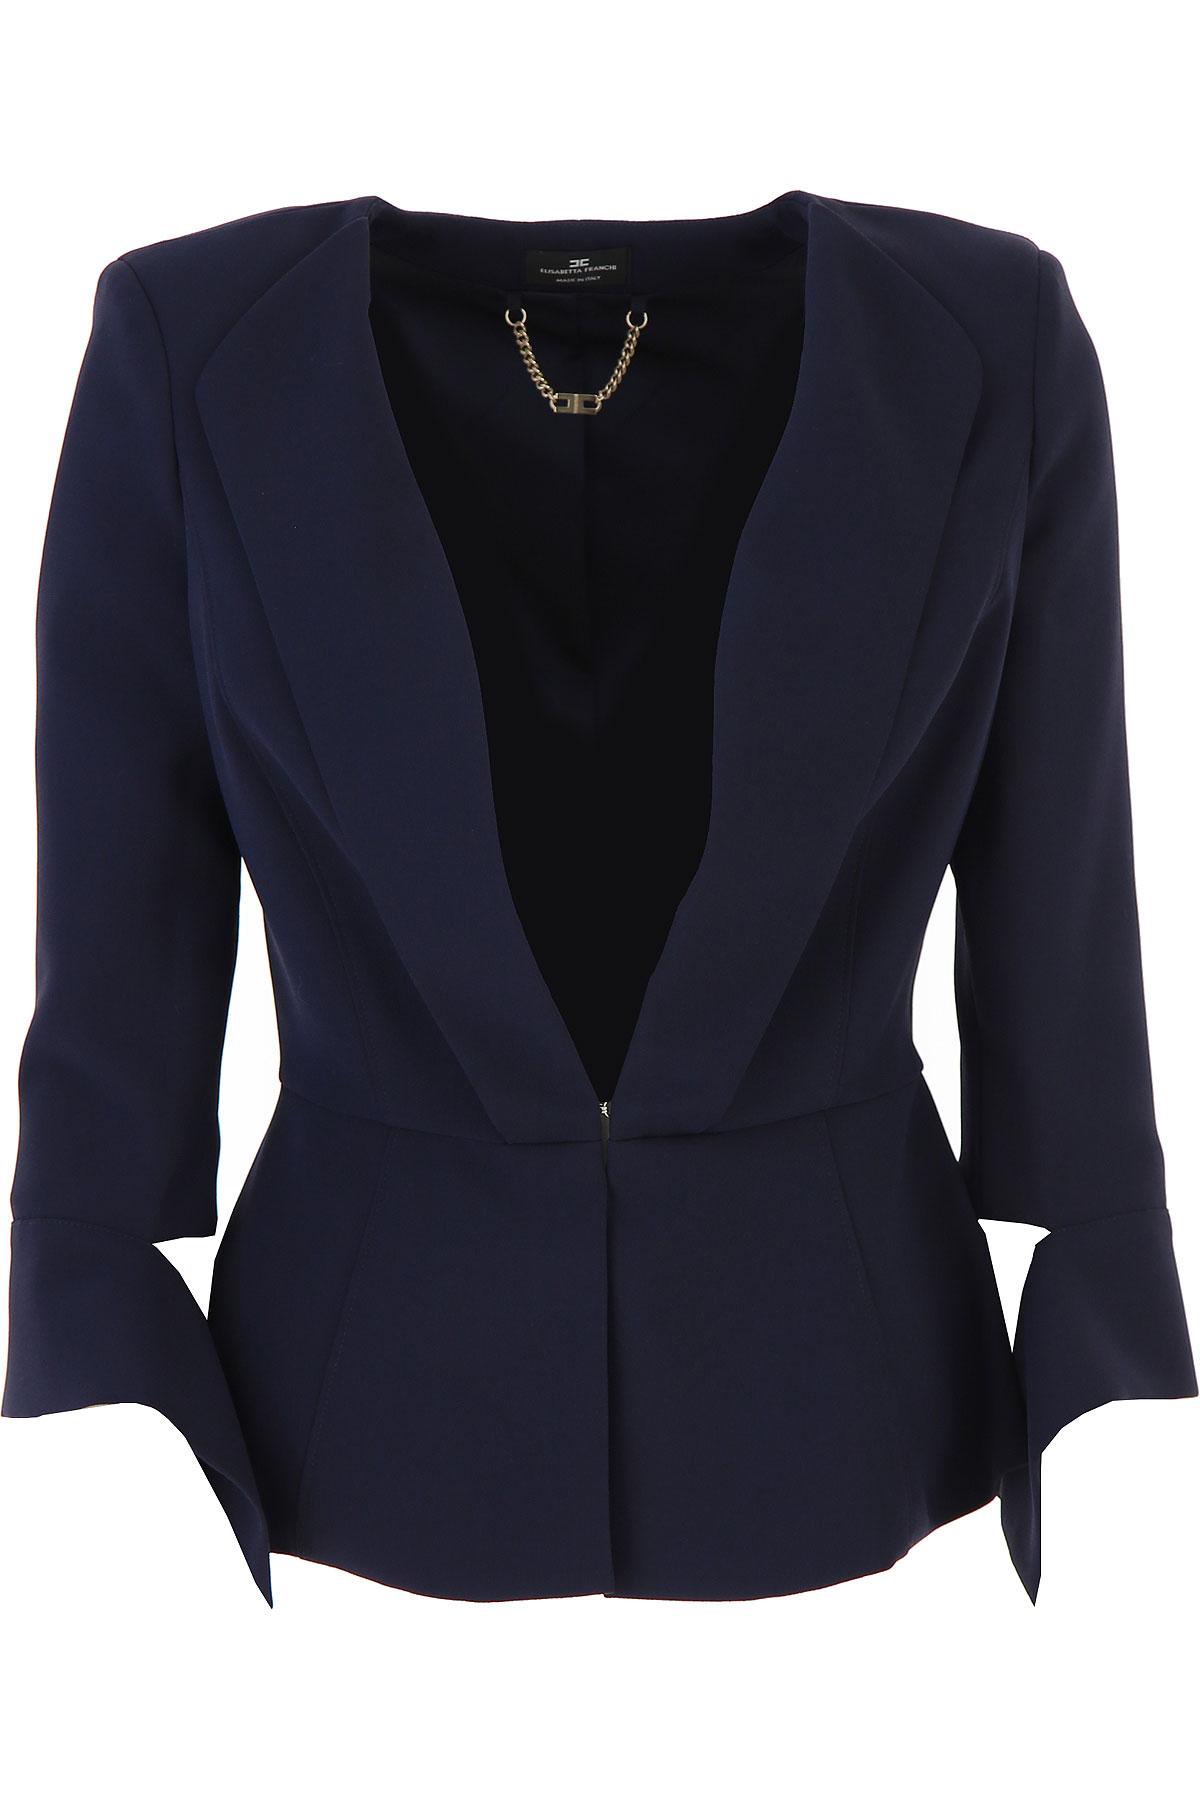 Elisabetta Franchi Blazer for Women On Sale, Midnight Blue, polyestere, 2019, 4 6